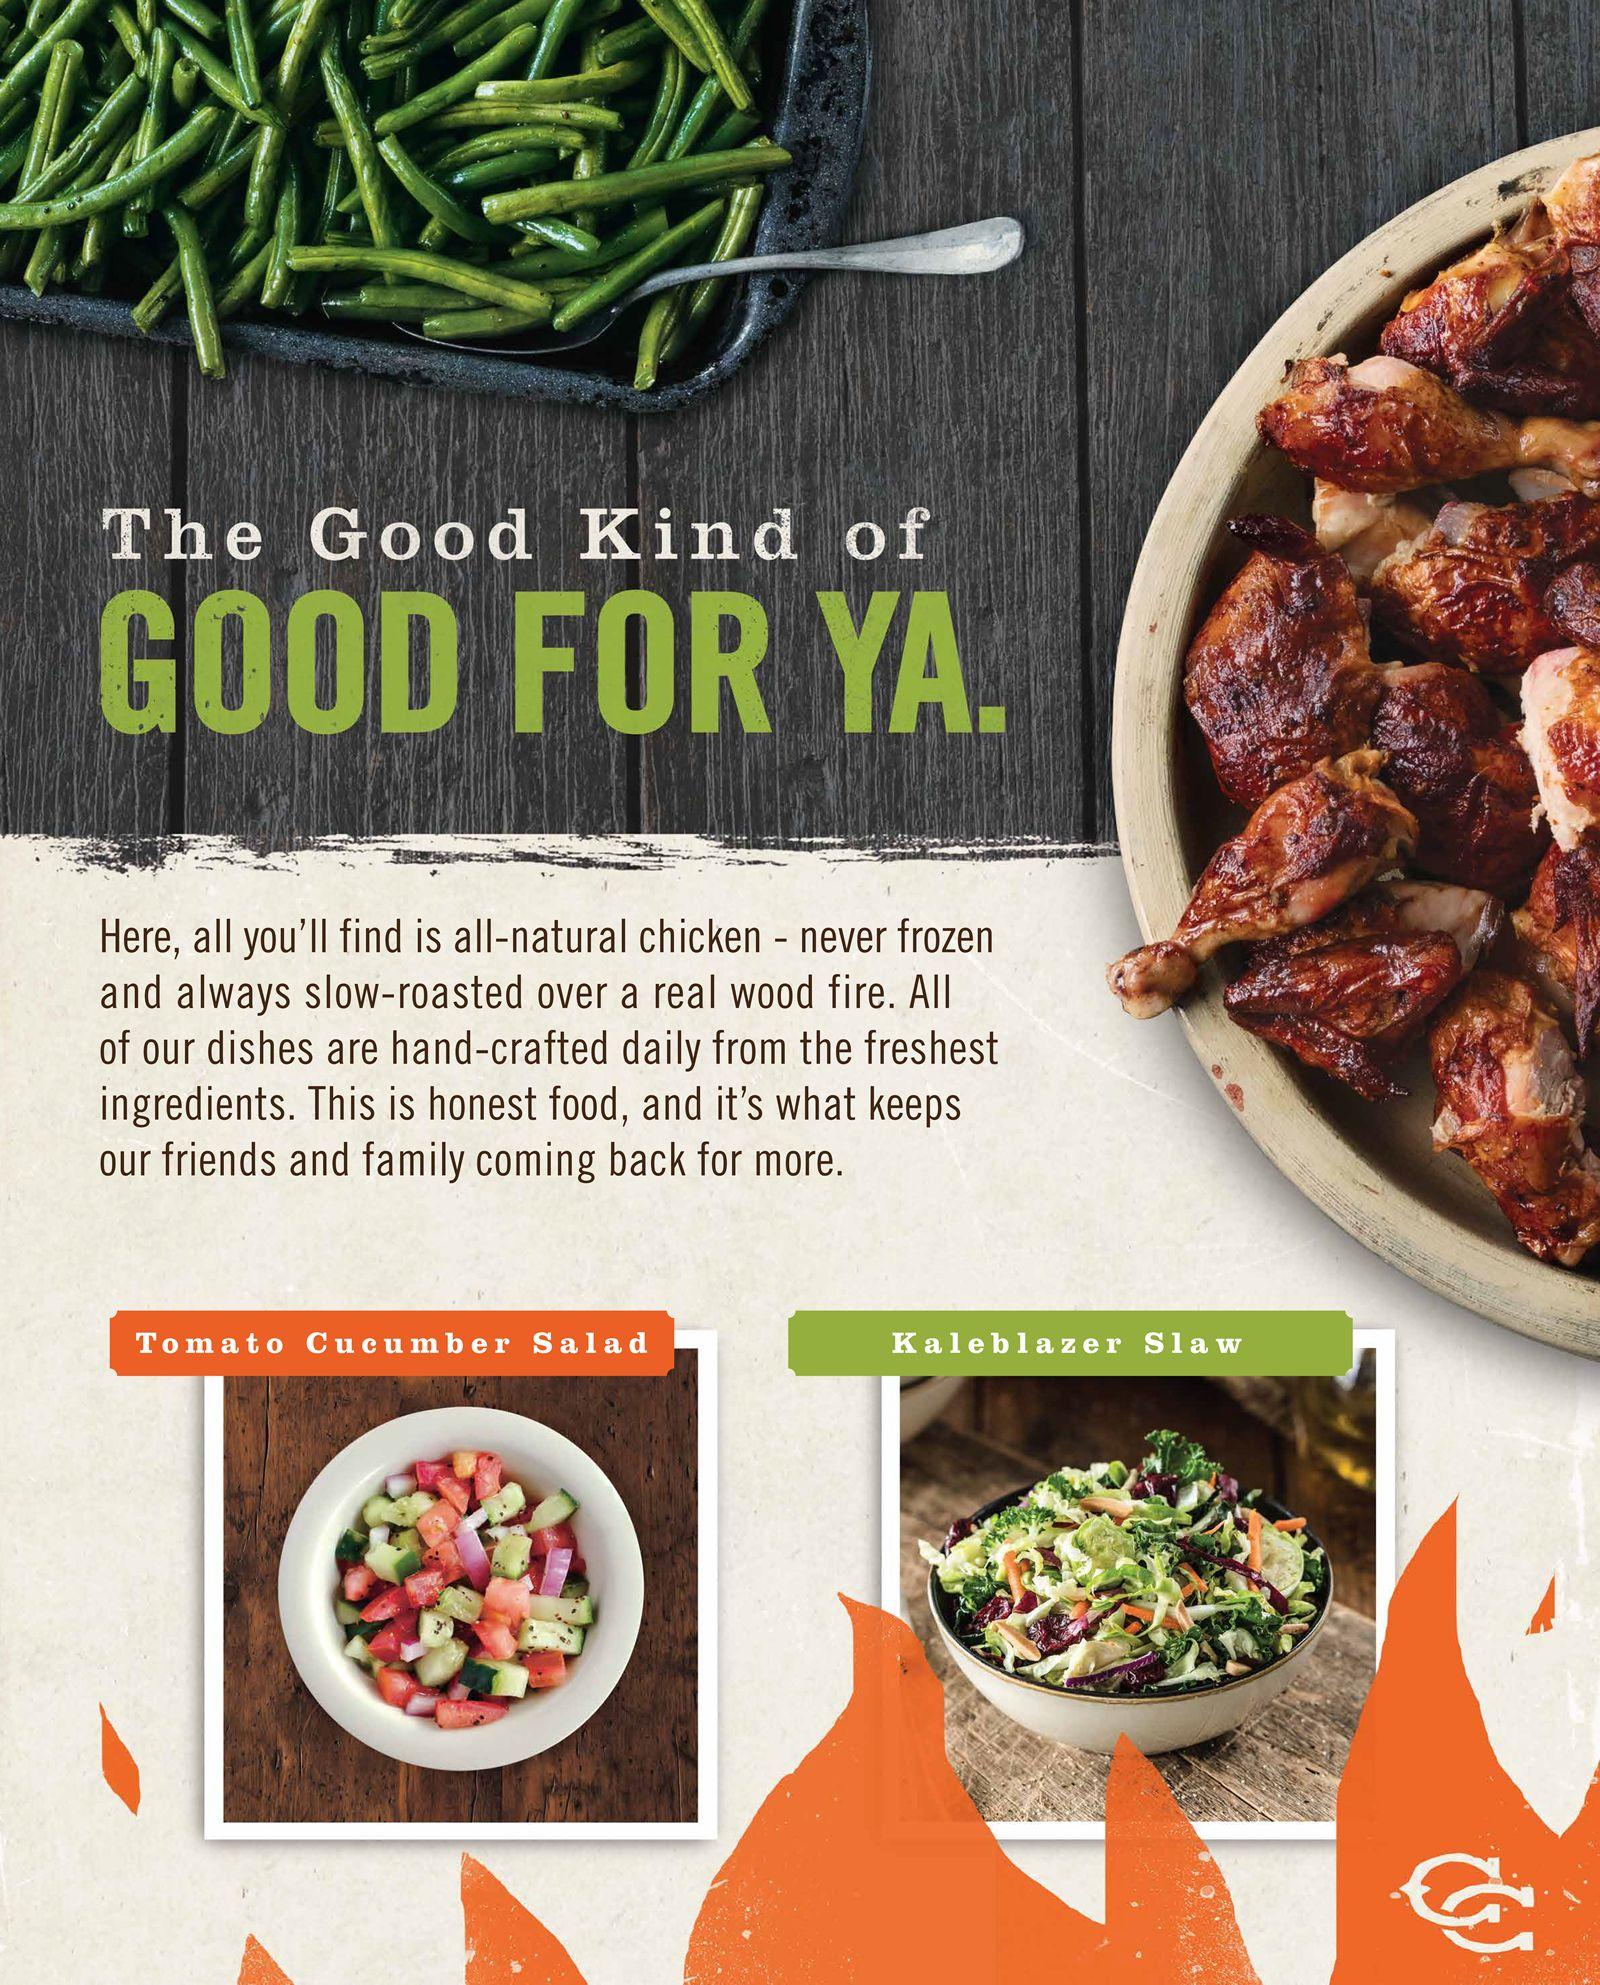 Rustle Up a Healthy, Delicious Meal at Cowboy Chicken